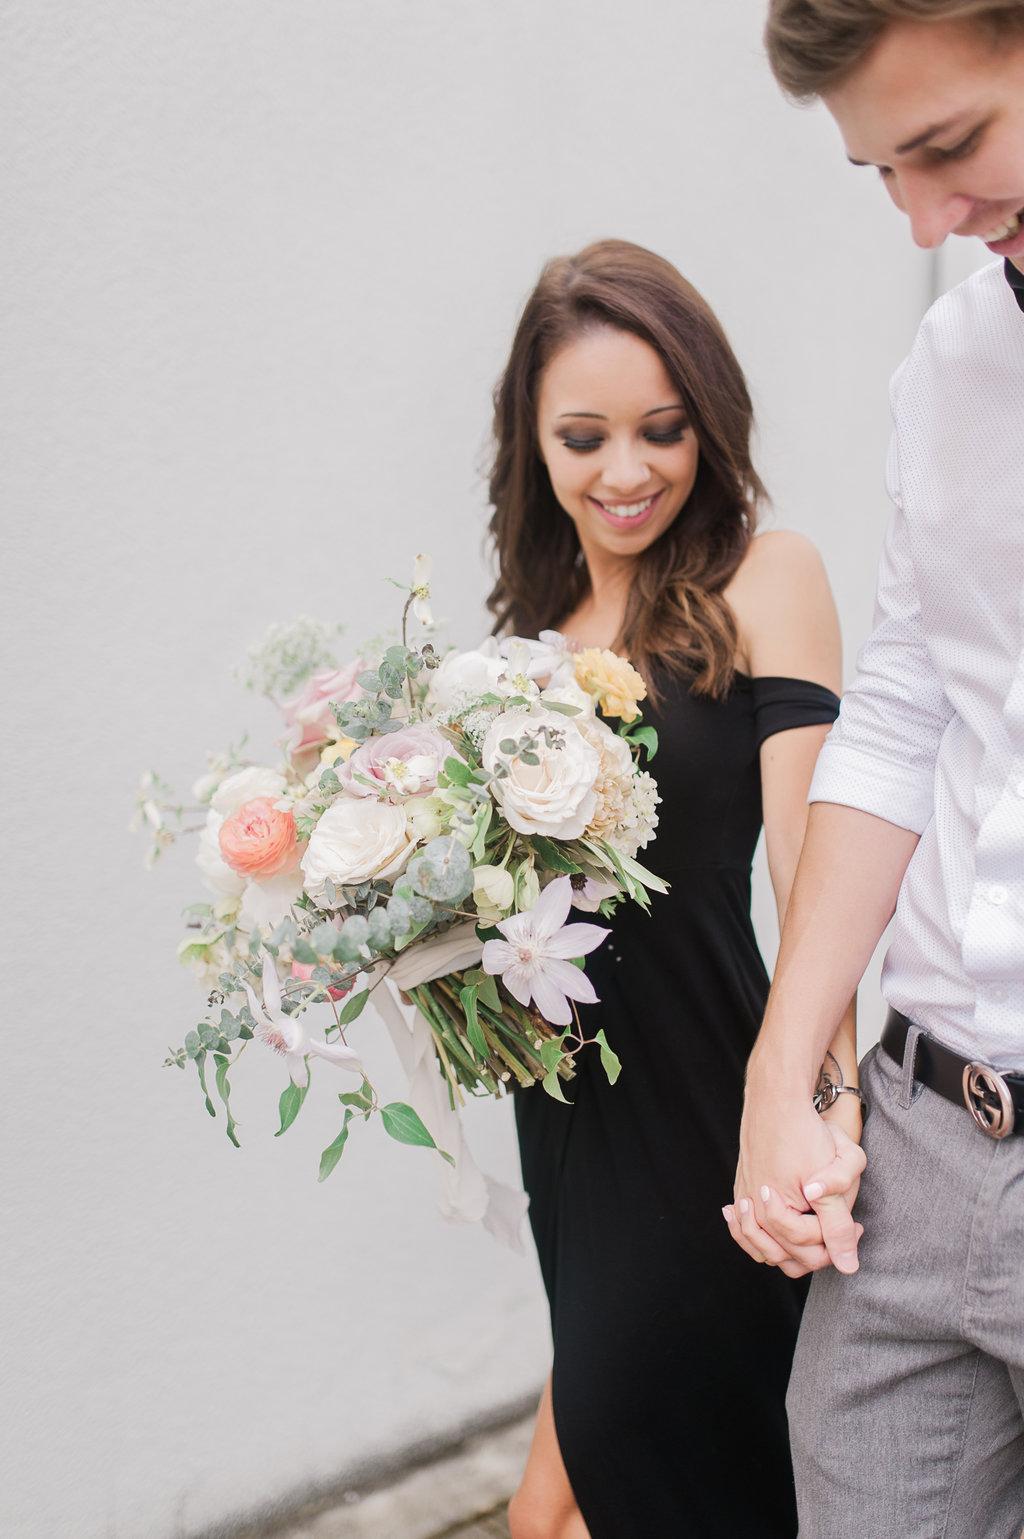 Marietta-Square-Engagement-atlanta-wedding-photographer-hannah-forsberg-5.jpg